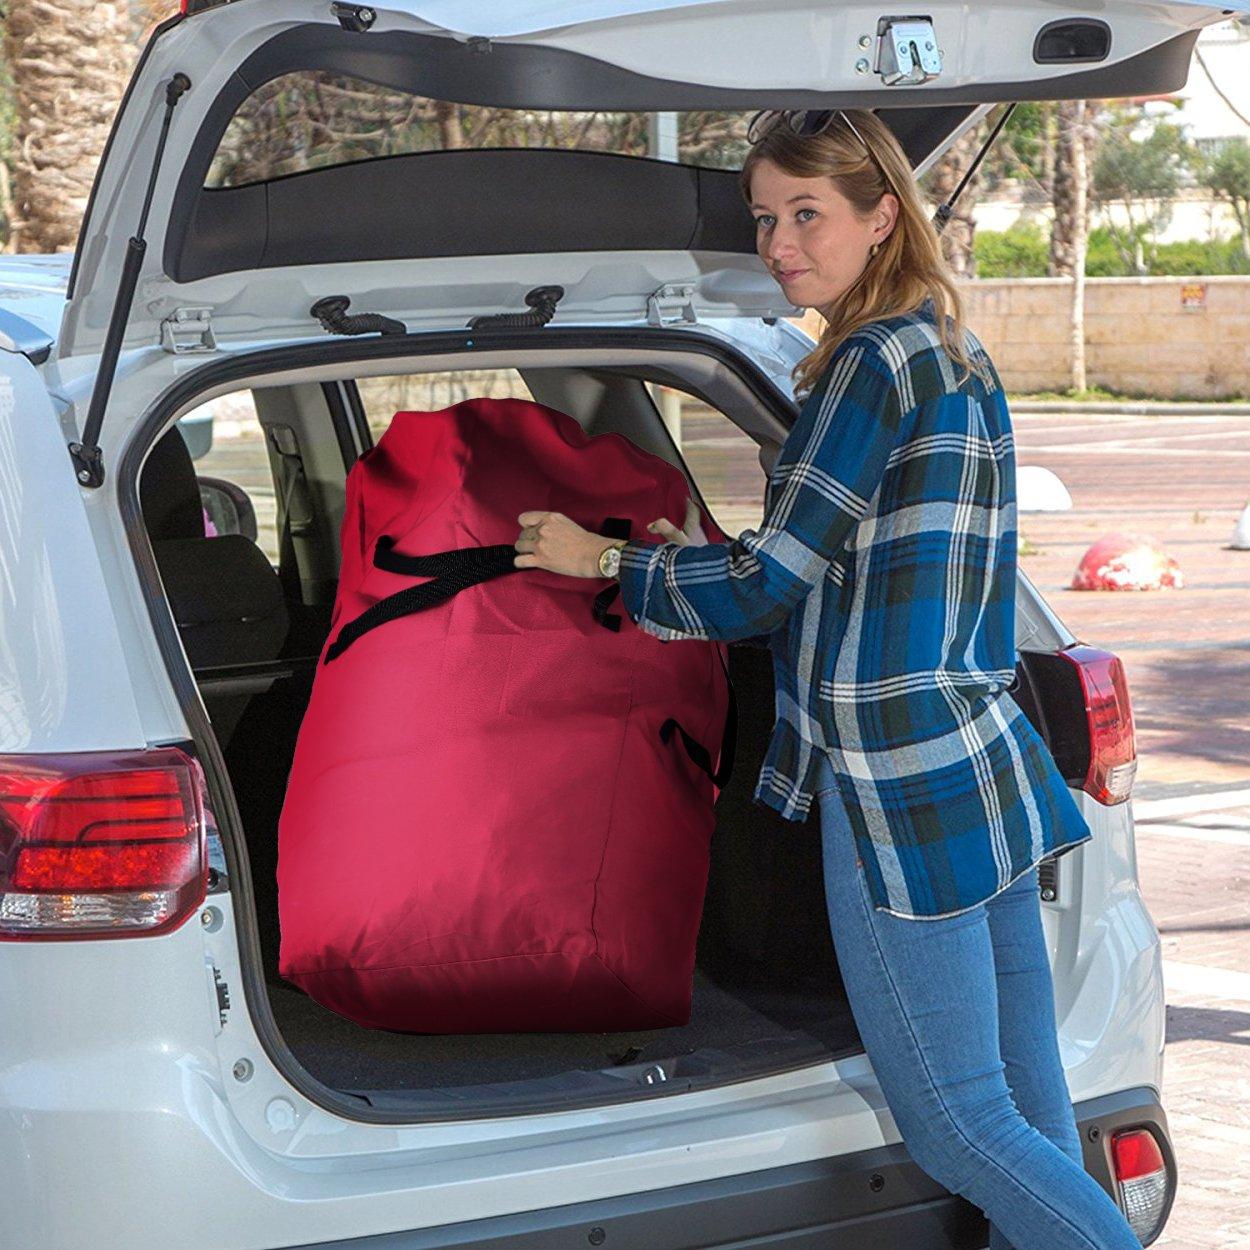 43 18 18 carritos de beb/é carros de mano sillas de ruedas color rojo bolsa impermeable de transporte Oxford para cargar asientos de auto Bolsa de viaje extra grande con correa para hombro